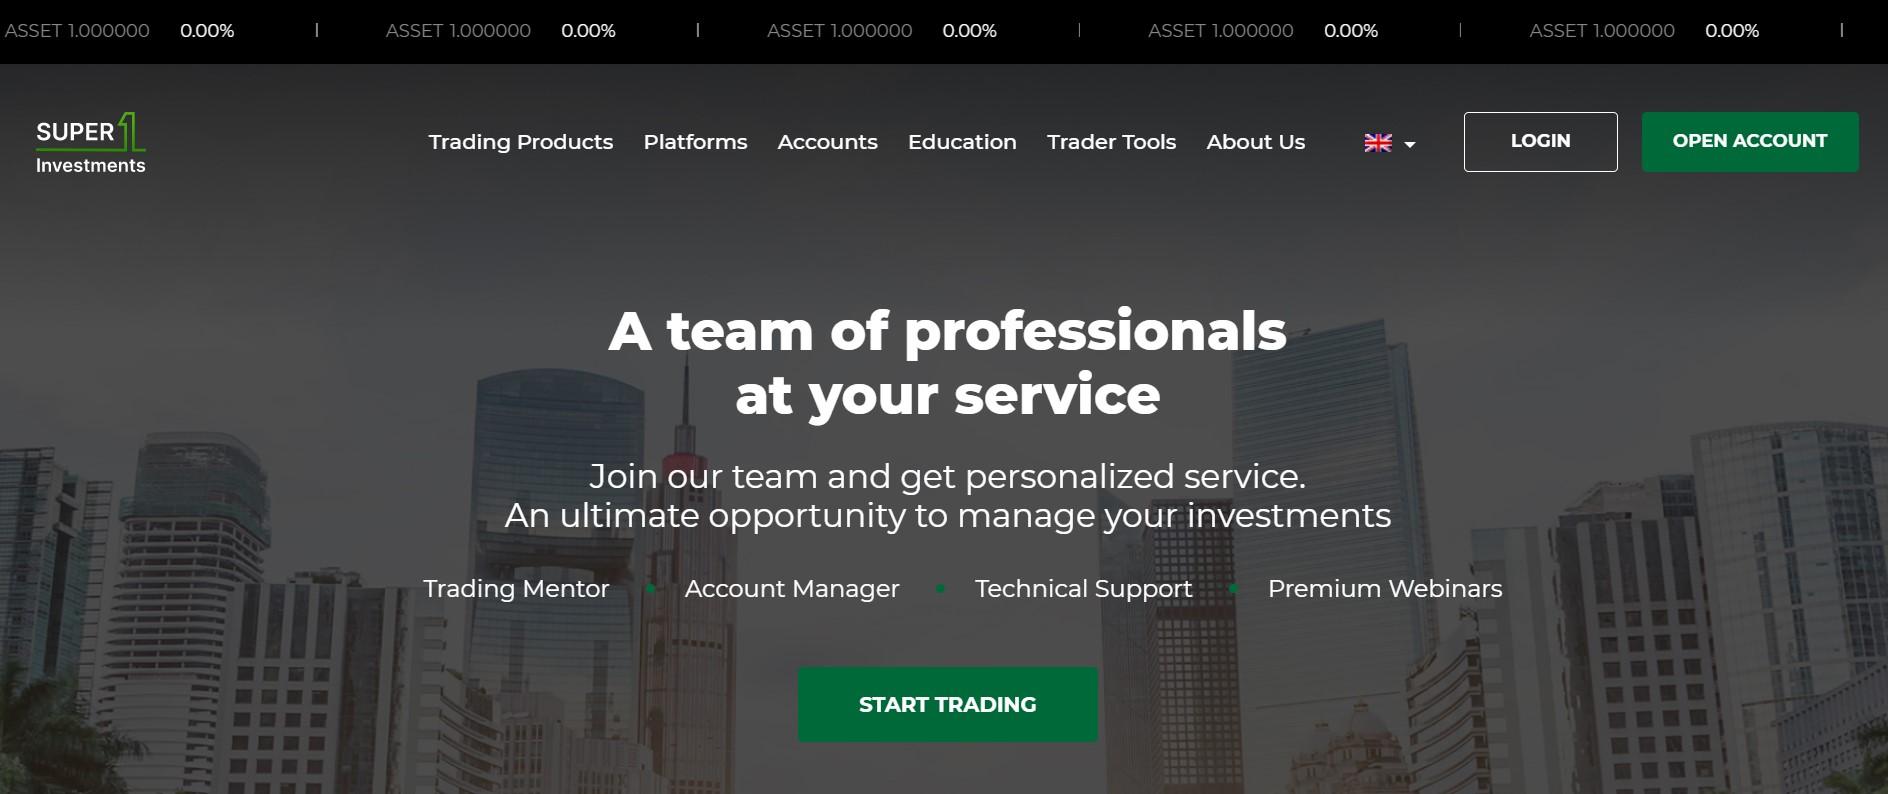 Super1Investments website